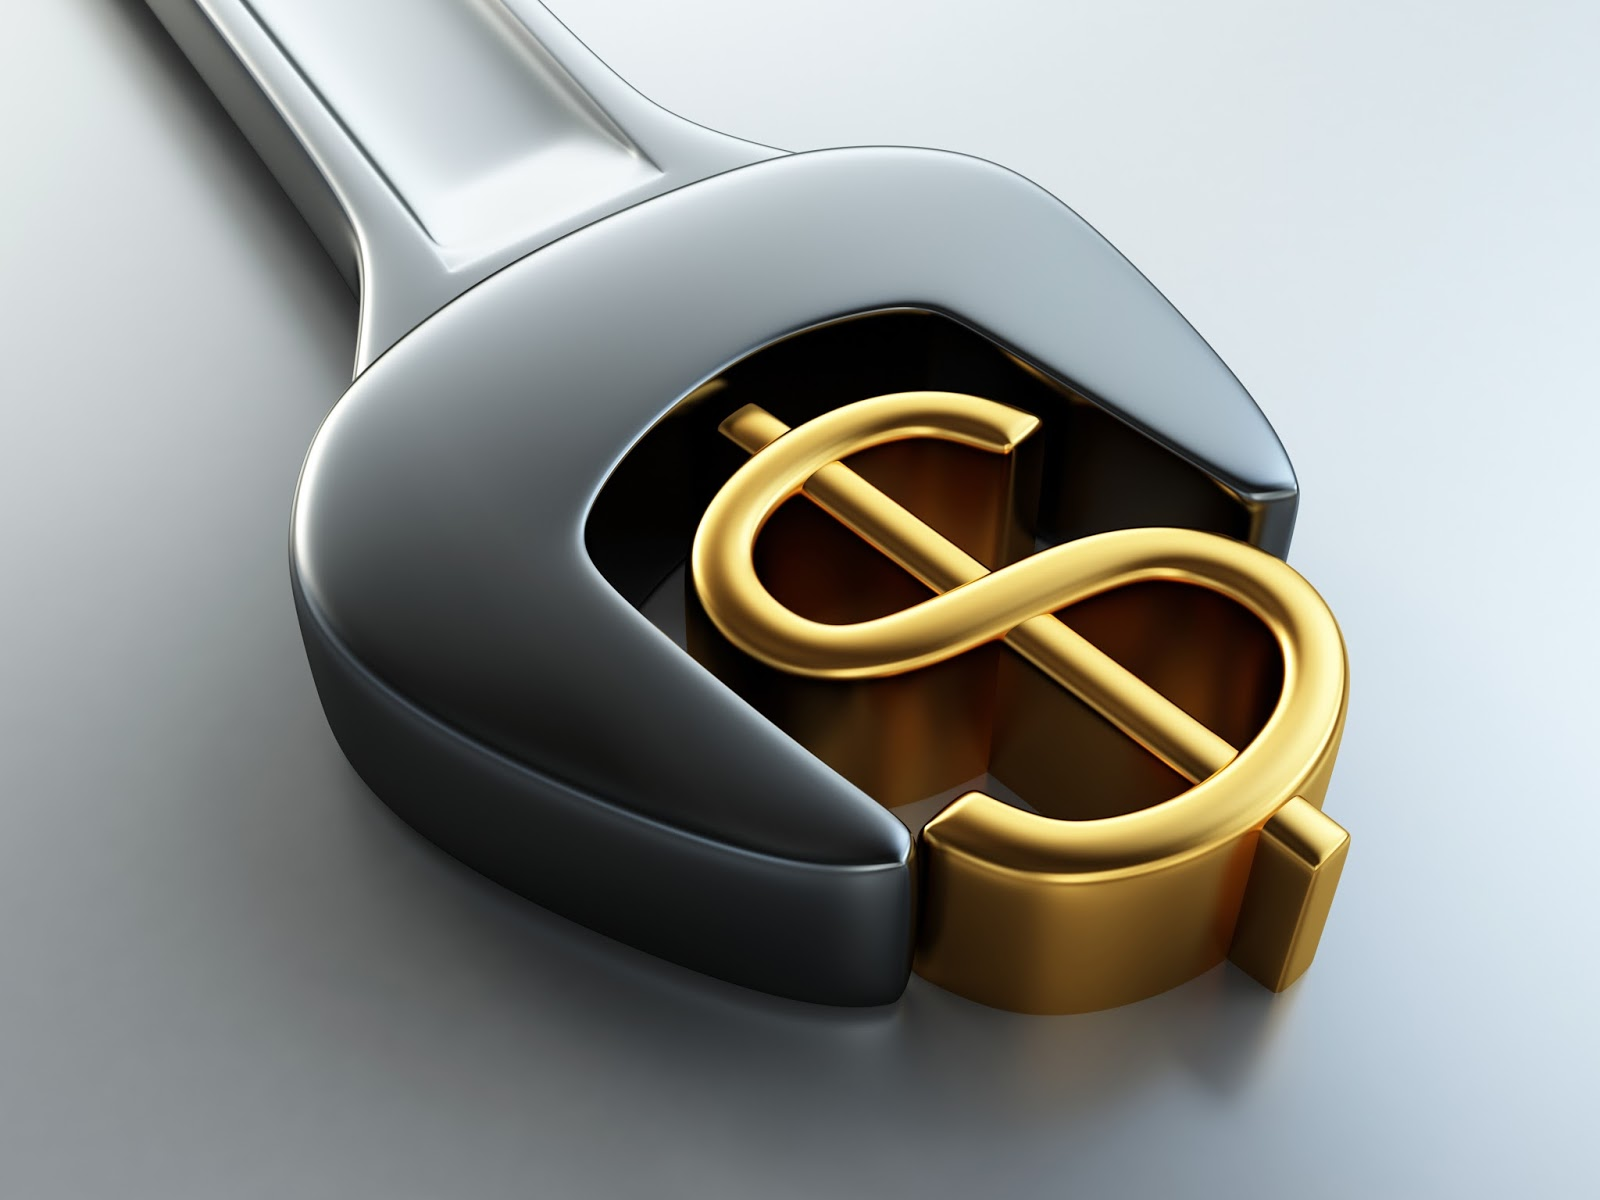 Broker forex tidak ada setoran minimum